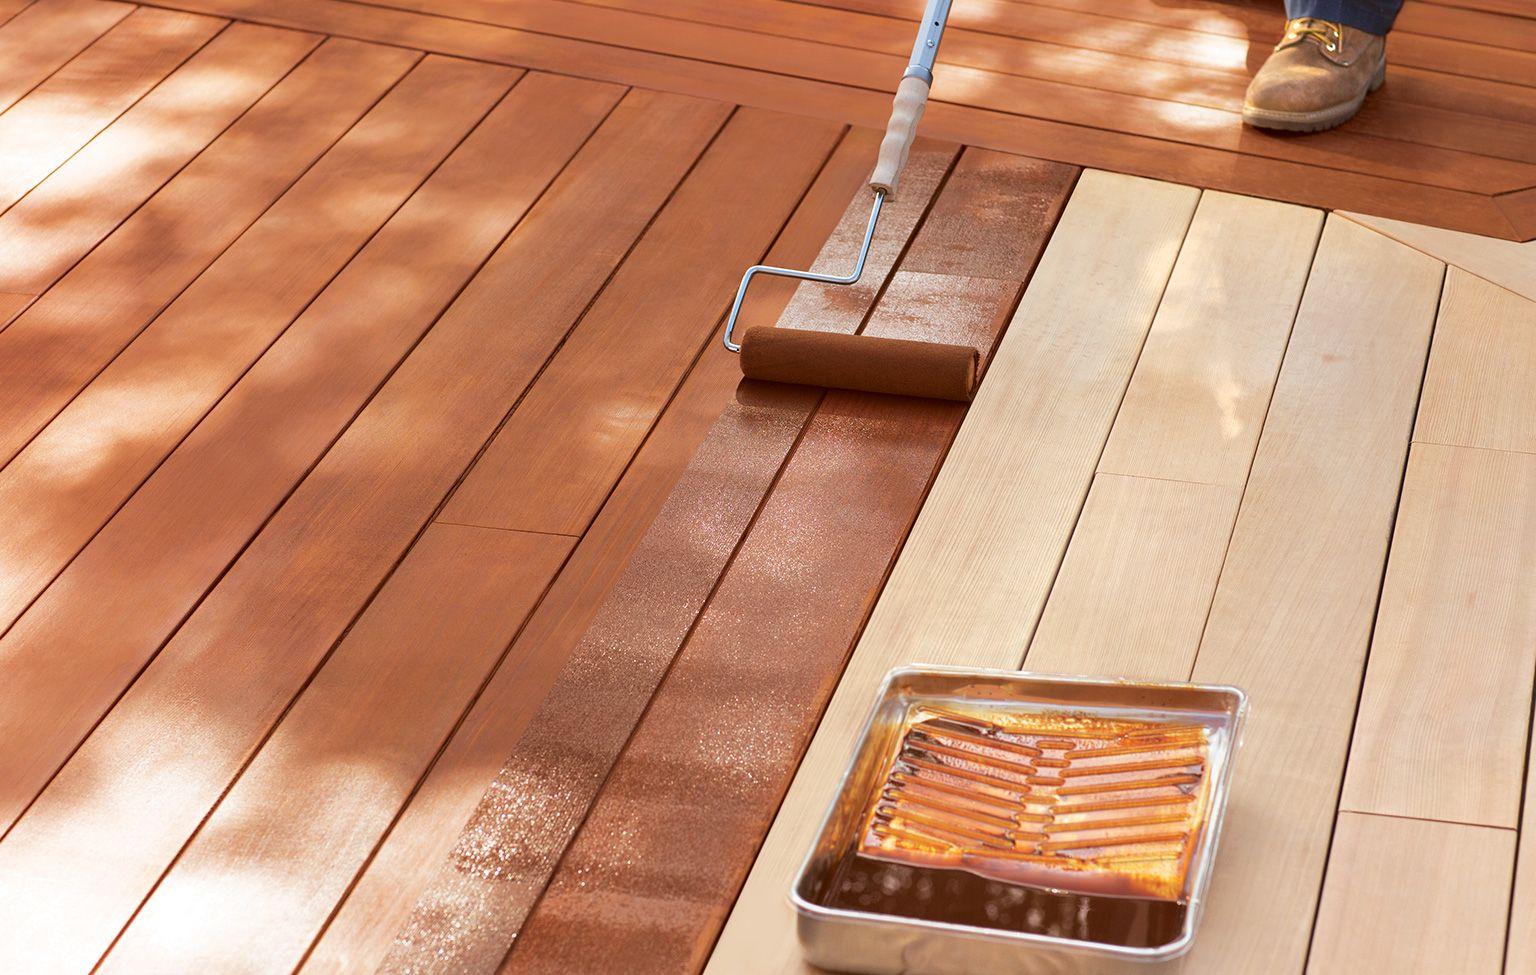 10 Best Deck Sealer Best Deck Stains In 2020 Reviews